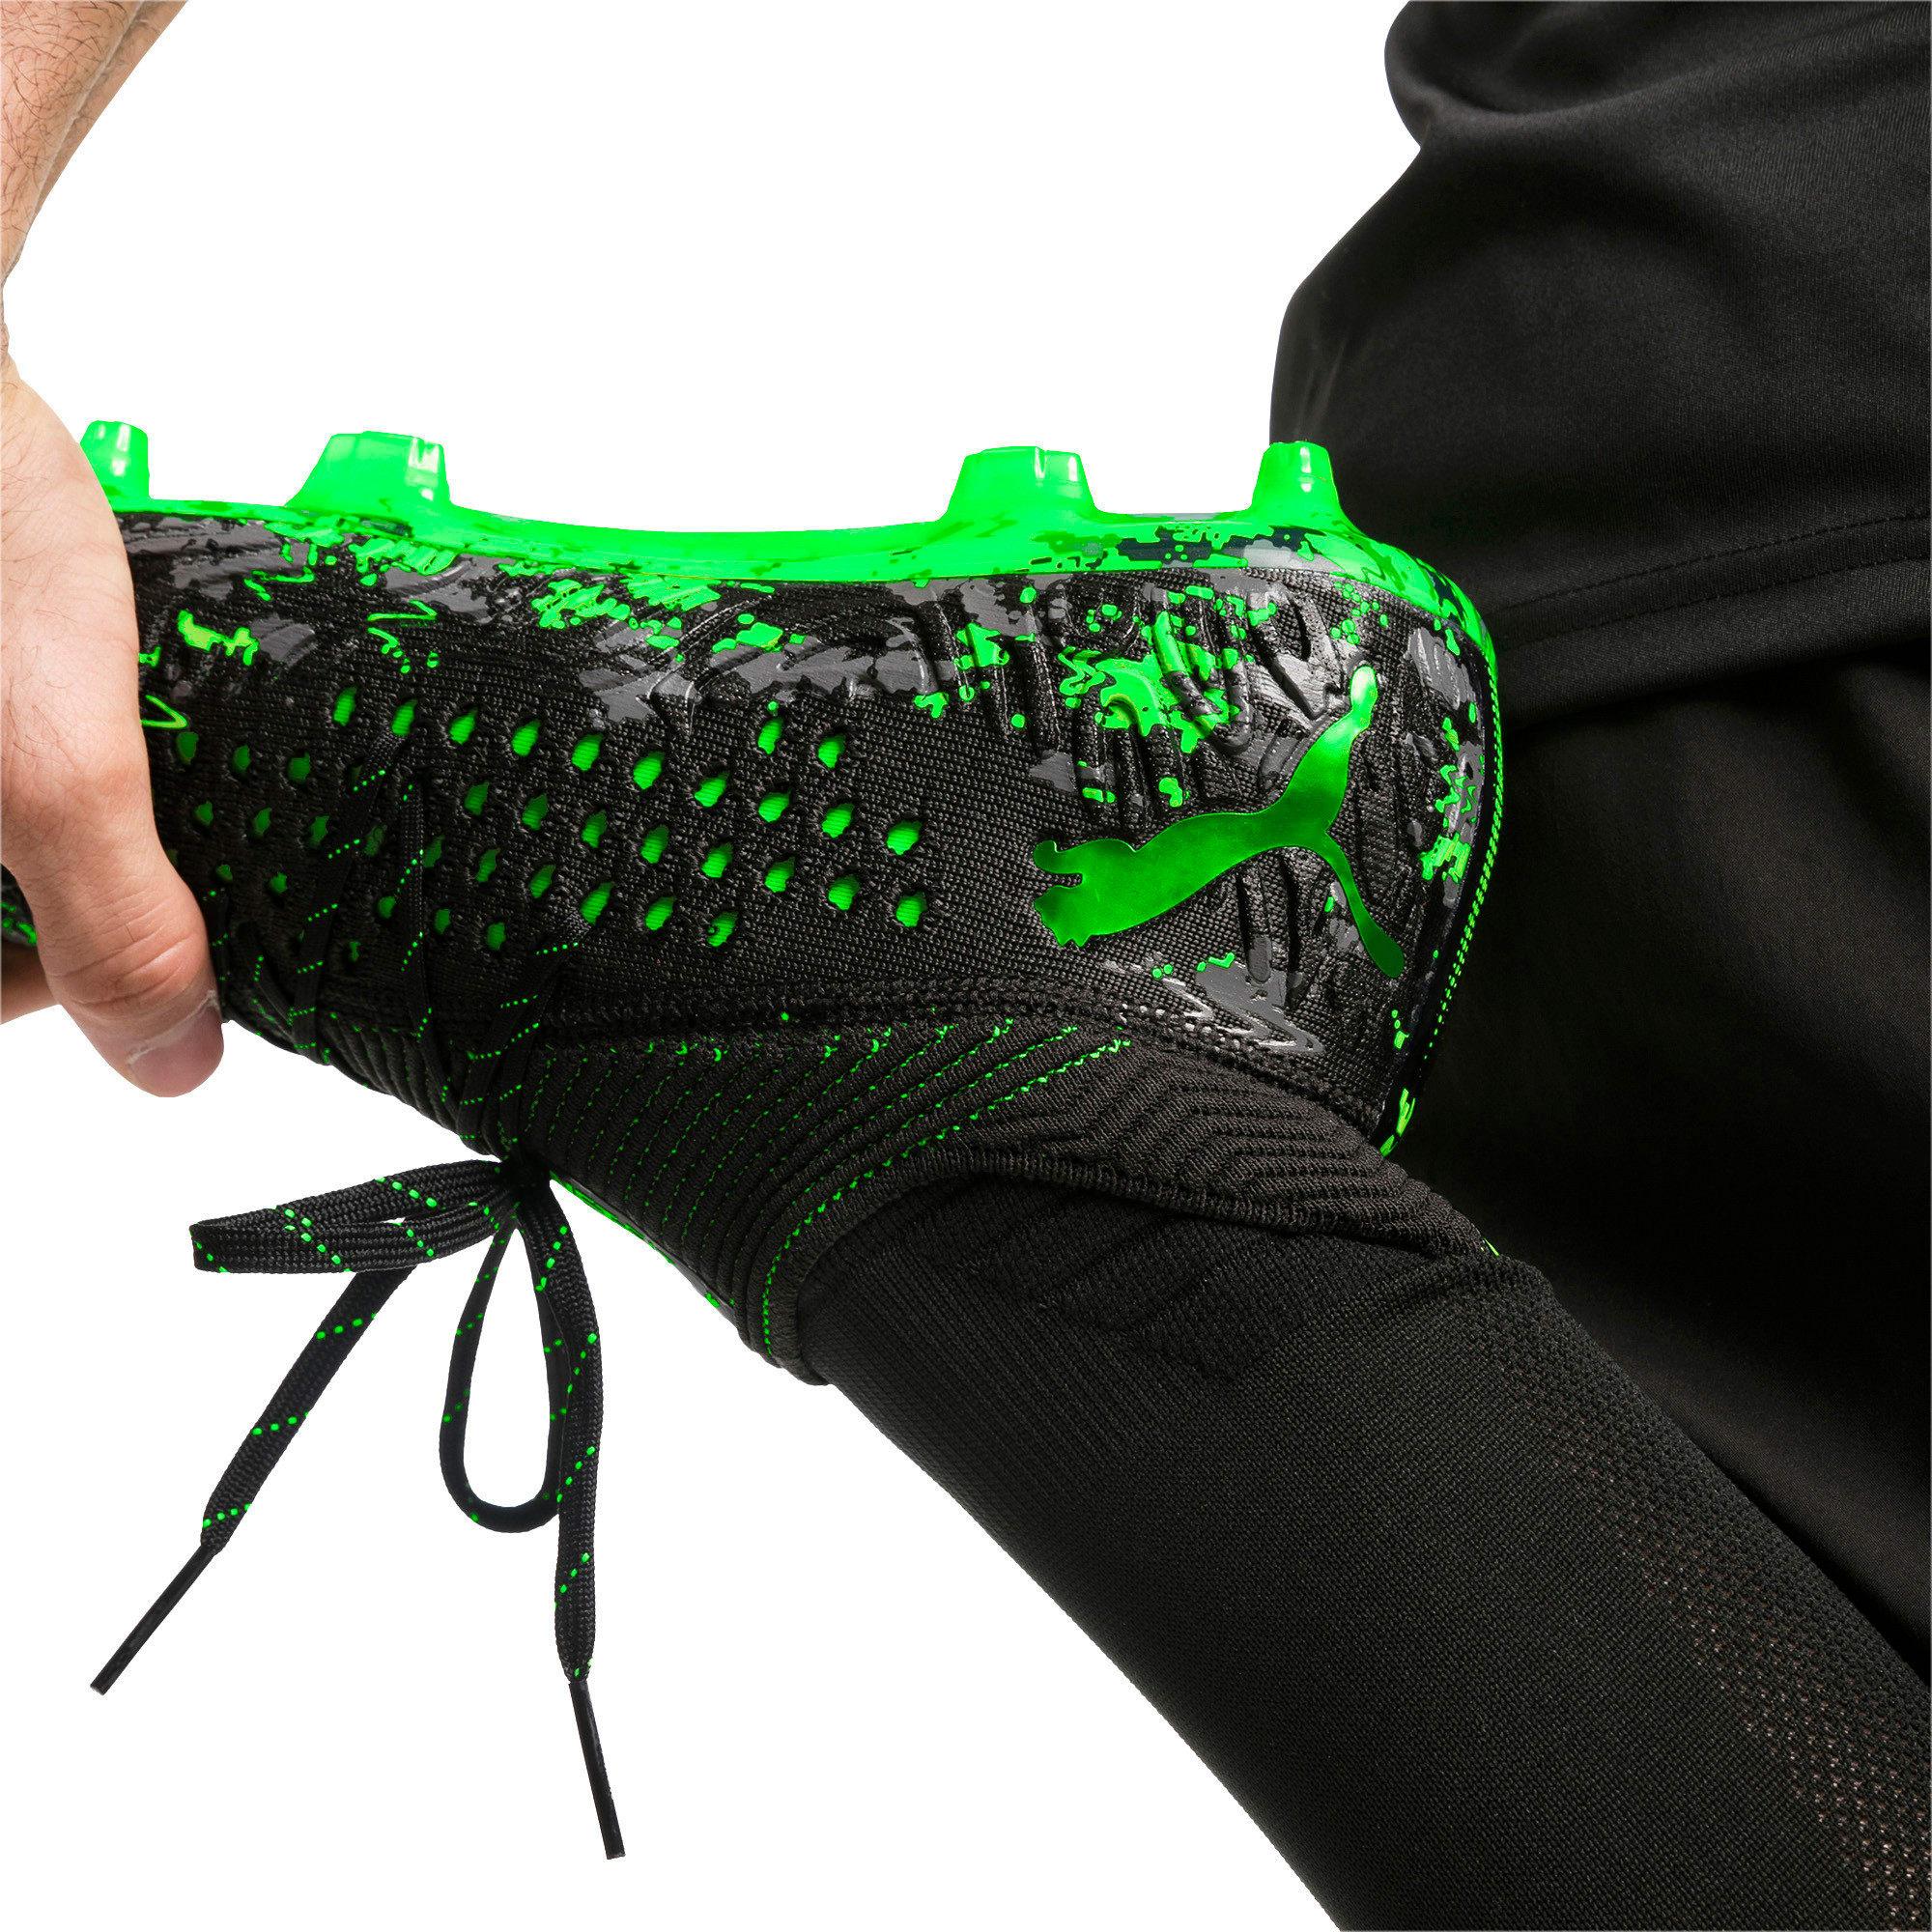 Thumbnail 3 of FUTURE 19.1 NETFIT FG/AG Men's Soccer Cleats, Black-Gray-Green Gecko, medium